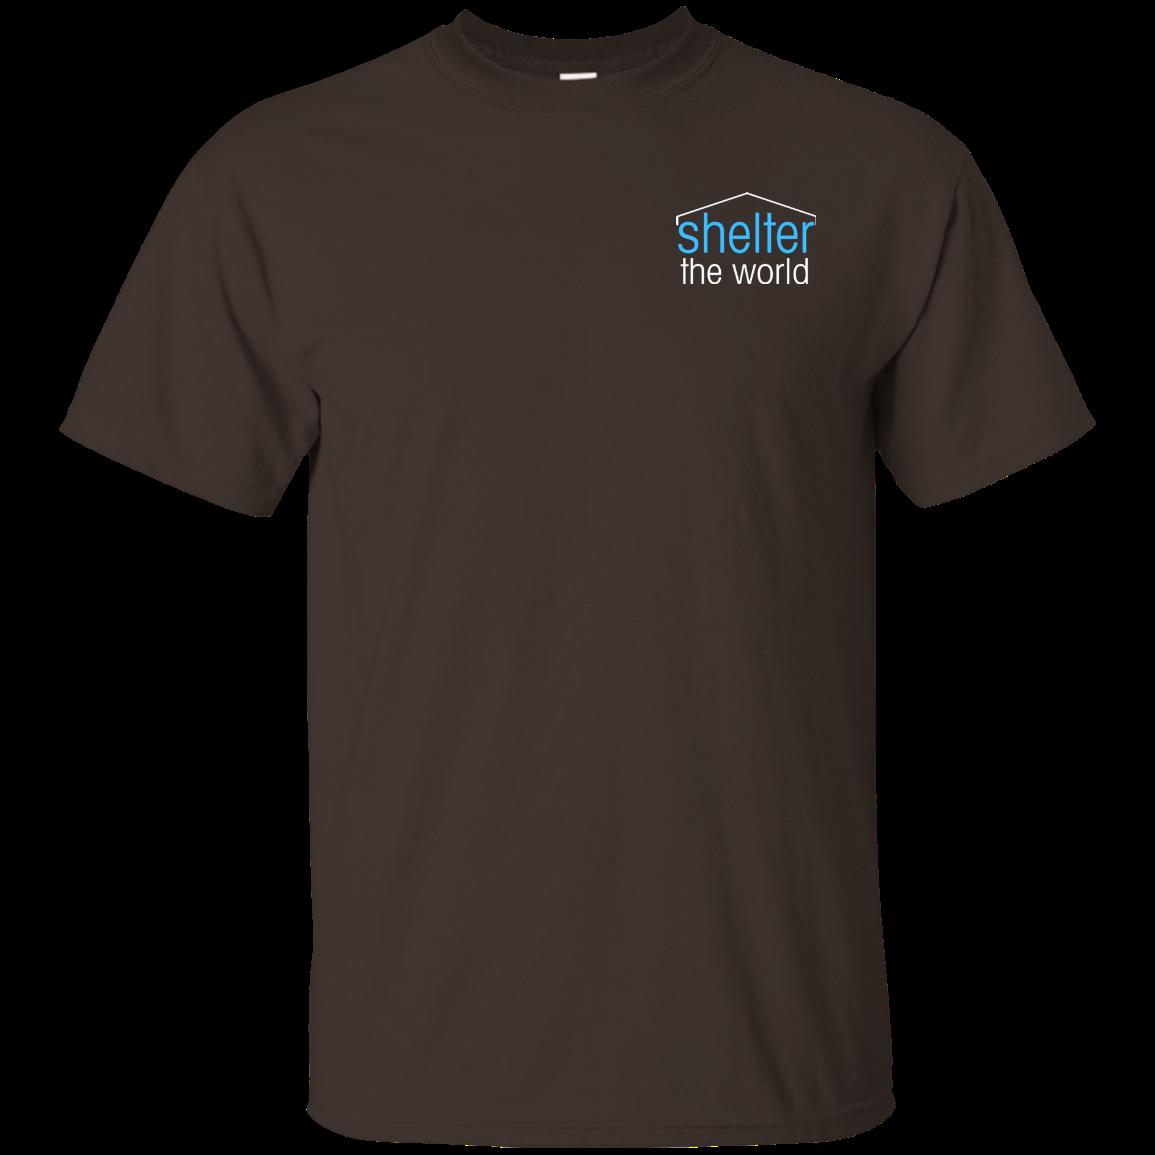 G200 gildan ultra cotton t shirt dark colors housing ministry store nvjuhfo Image collections